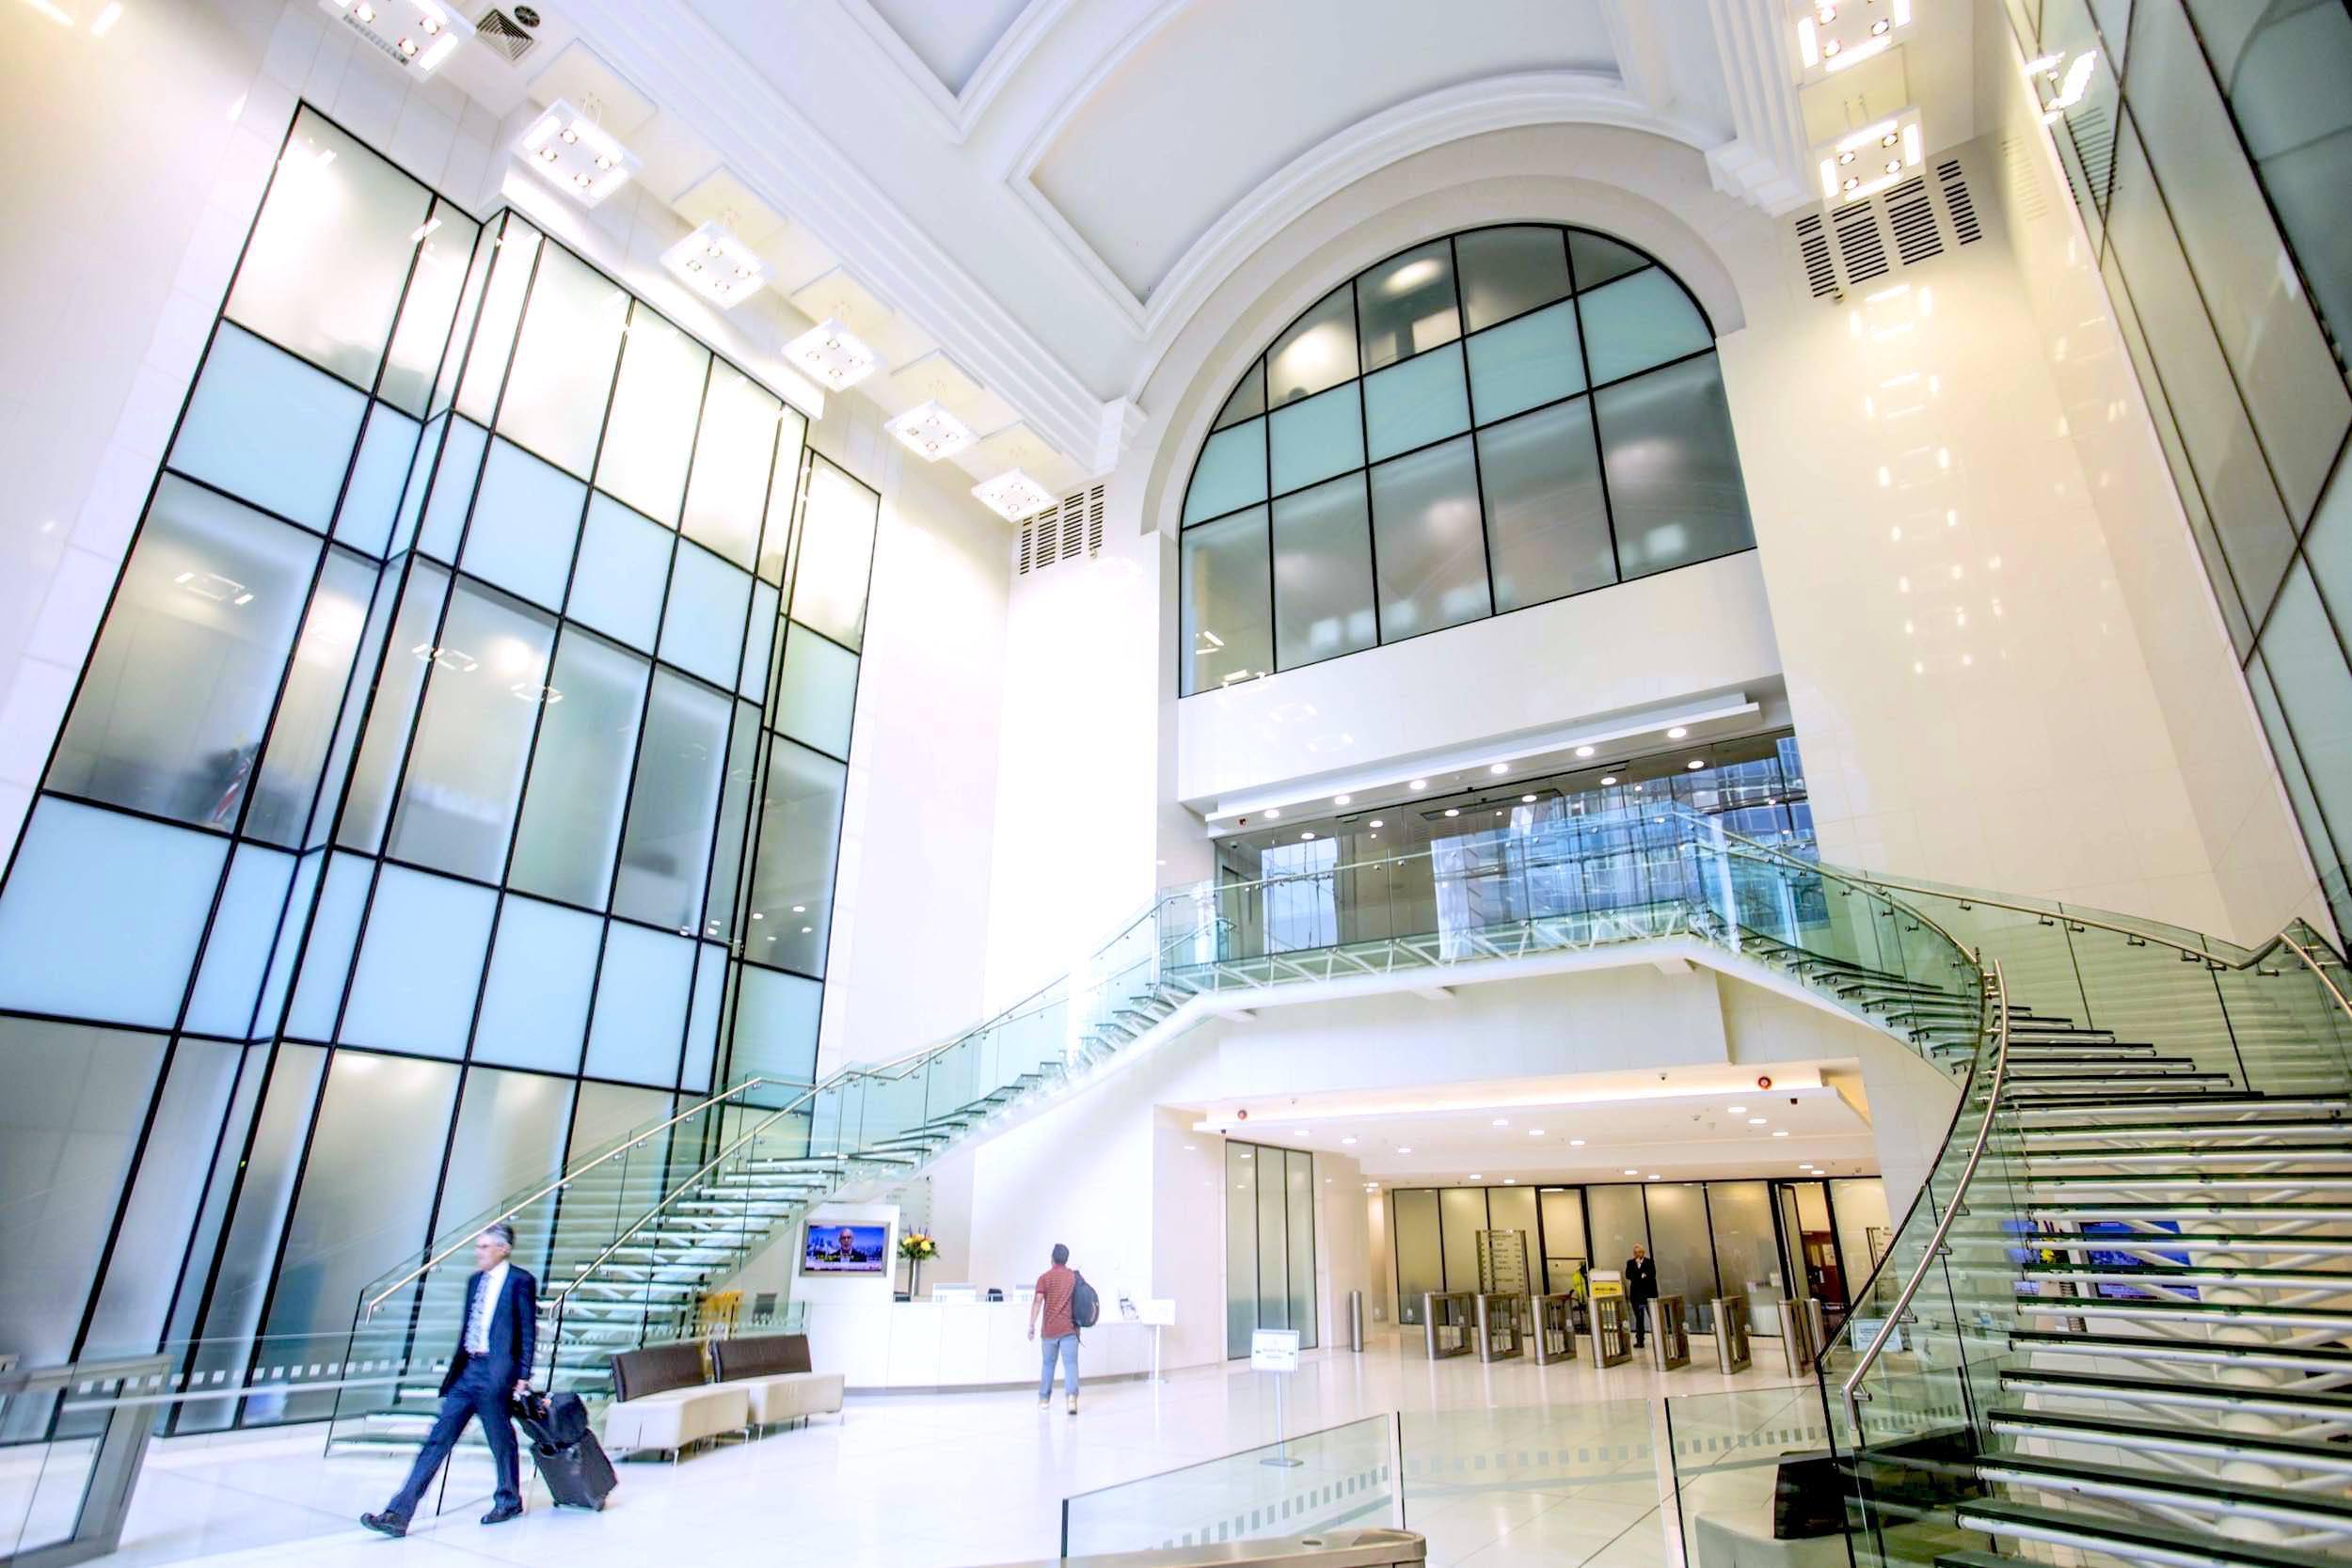 fscs-age-friendly-employer-renegade-generation-foyer-5.jpg